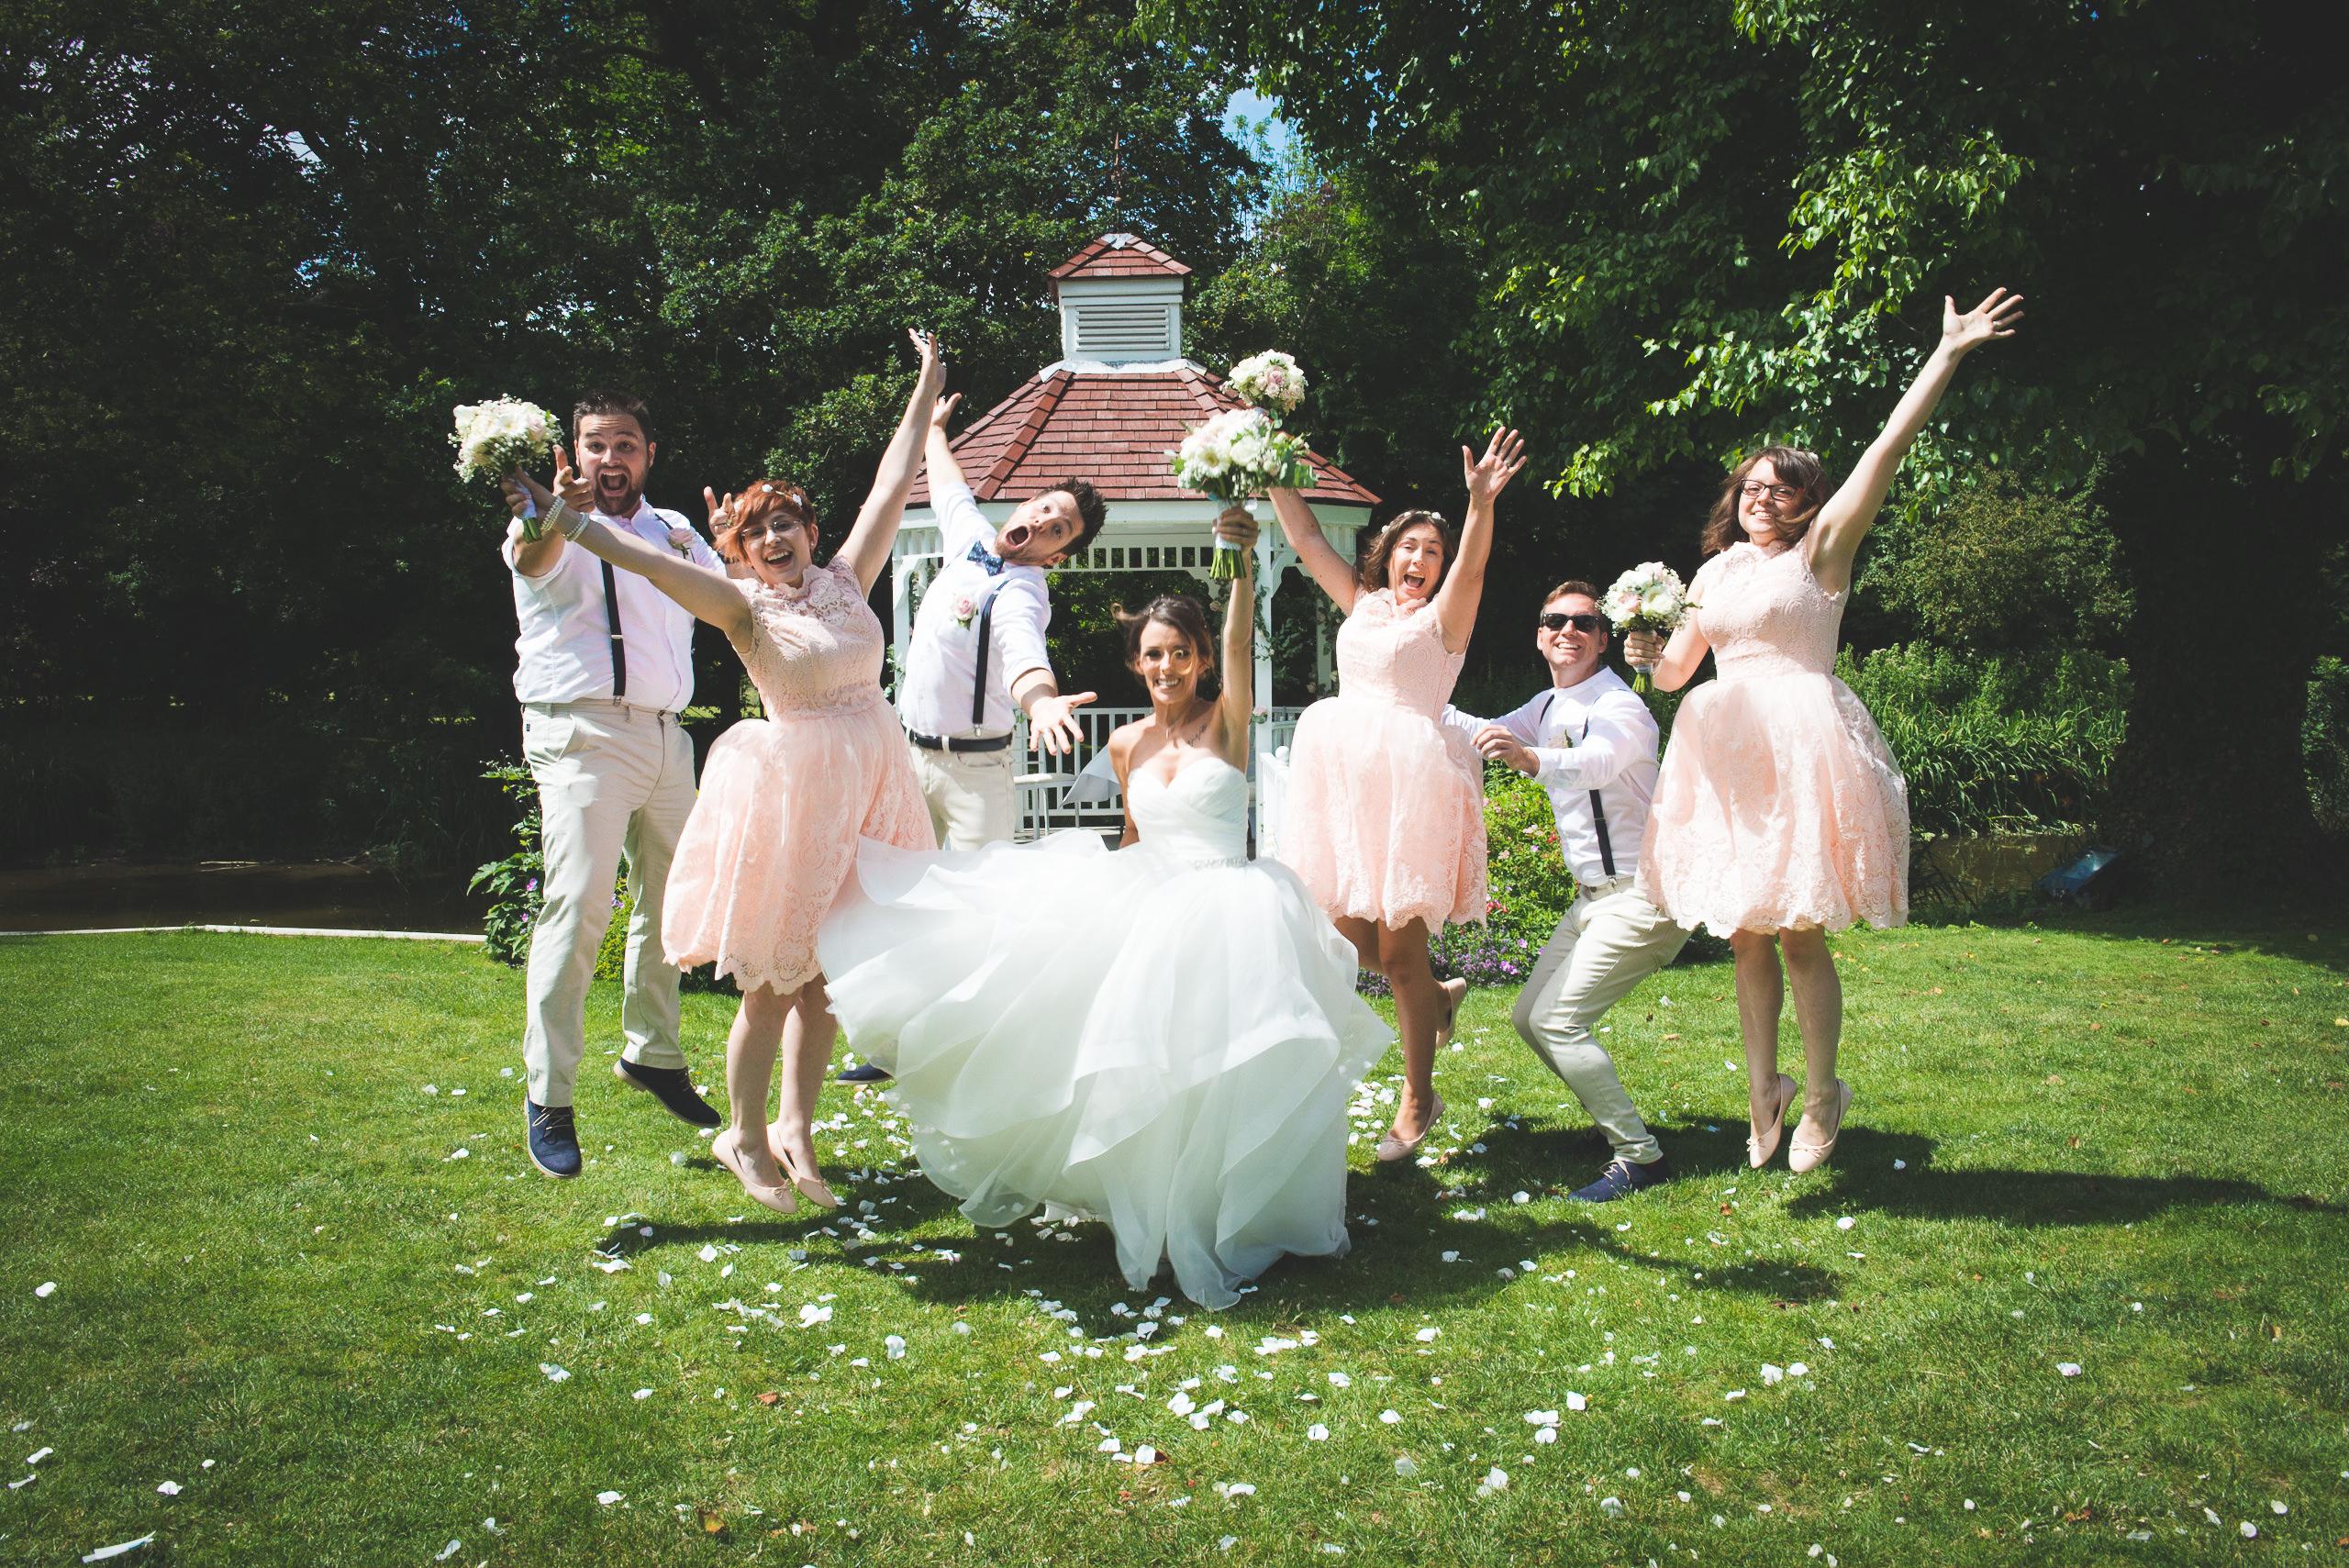 Family photos, group wedding shot, Bridesmaids, wedding photography, sheene mill, disney inspired wedding